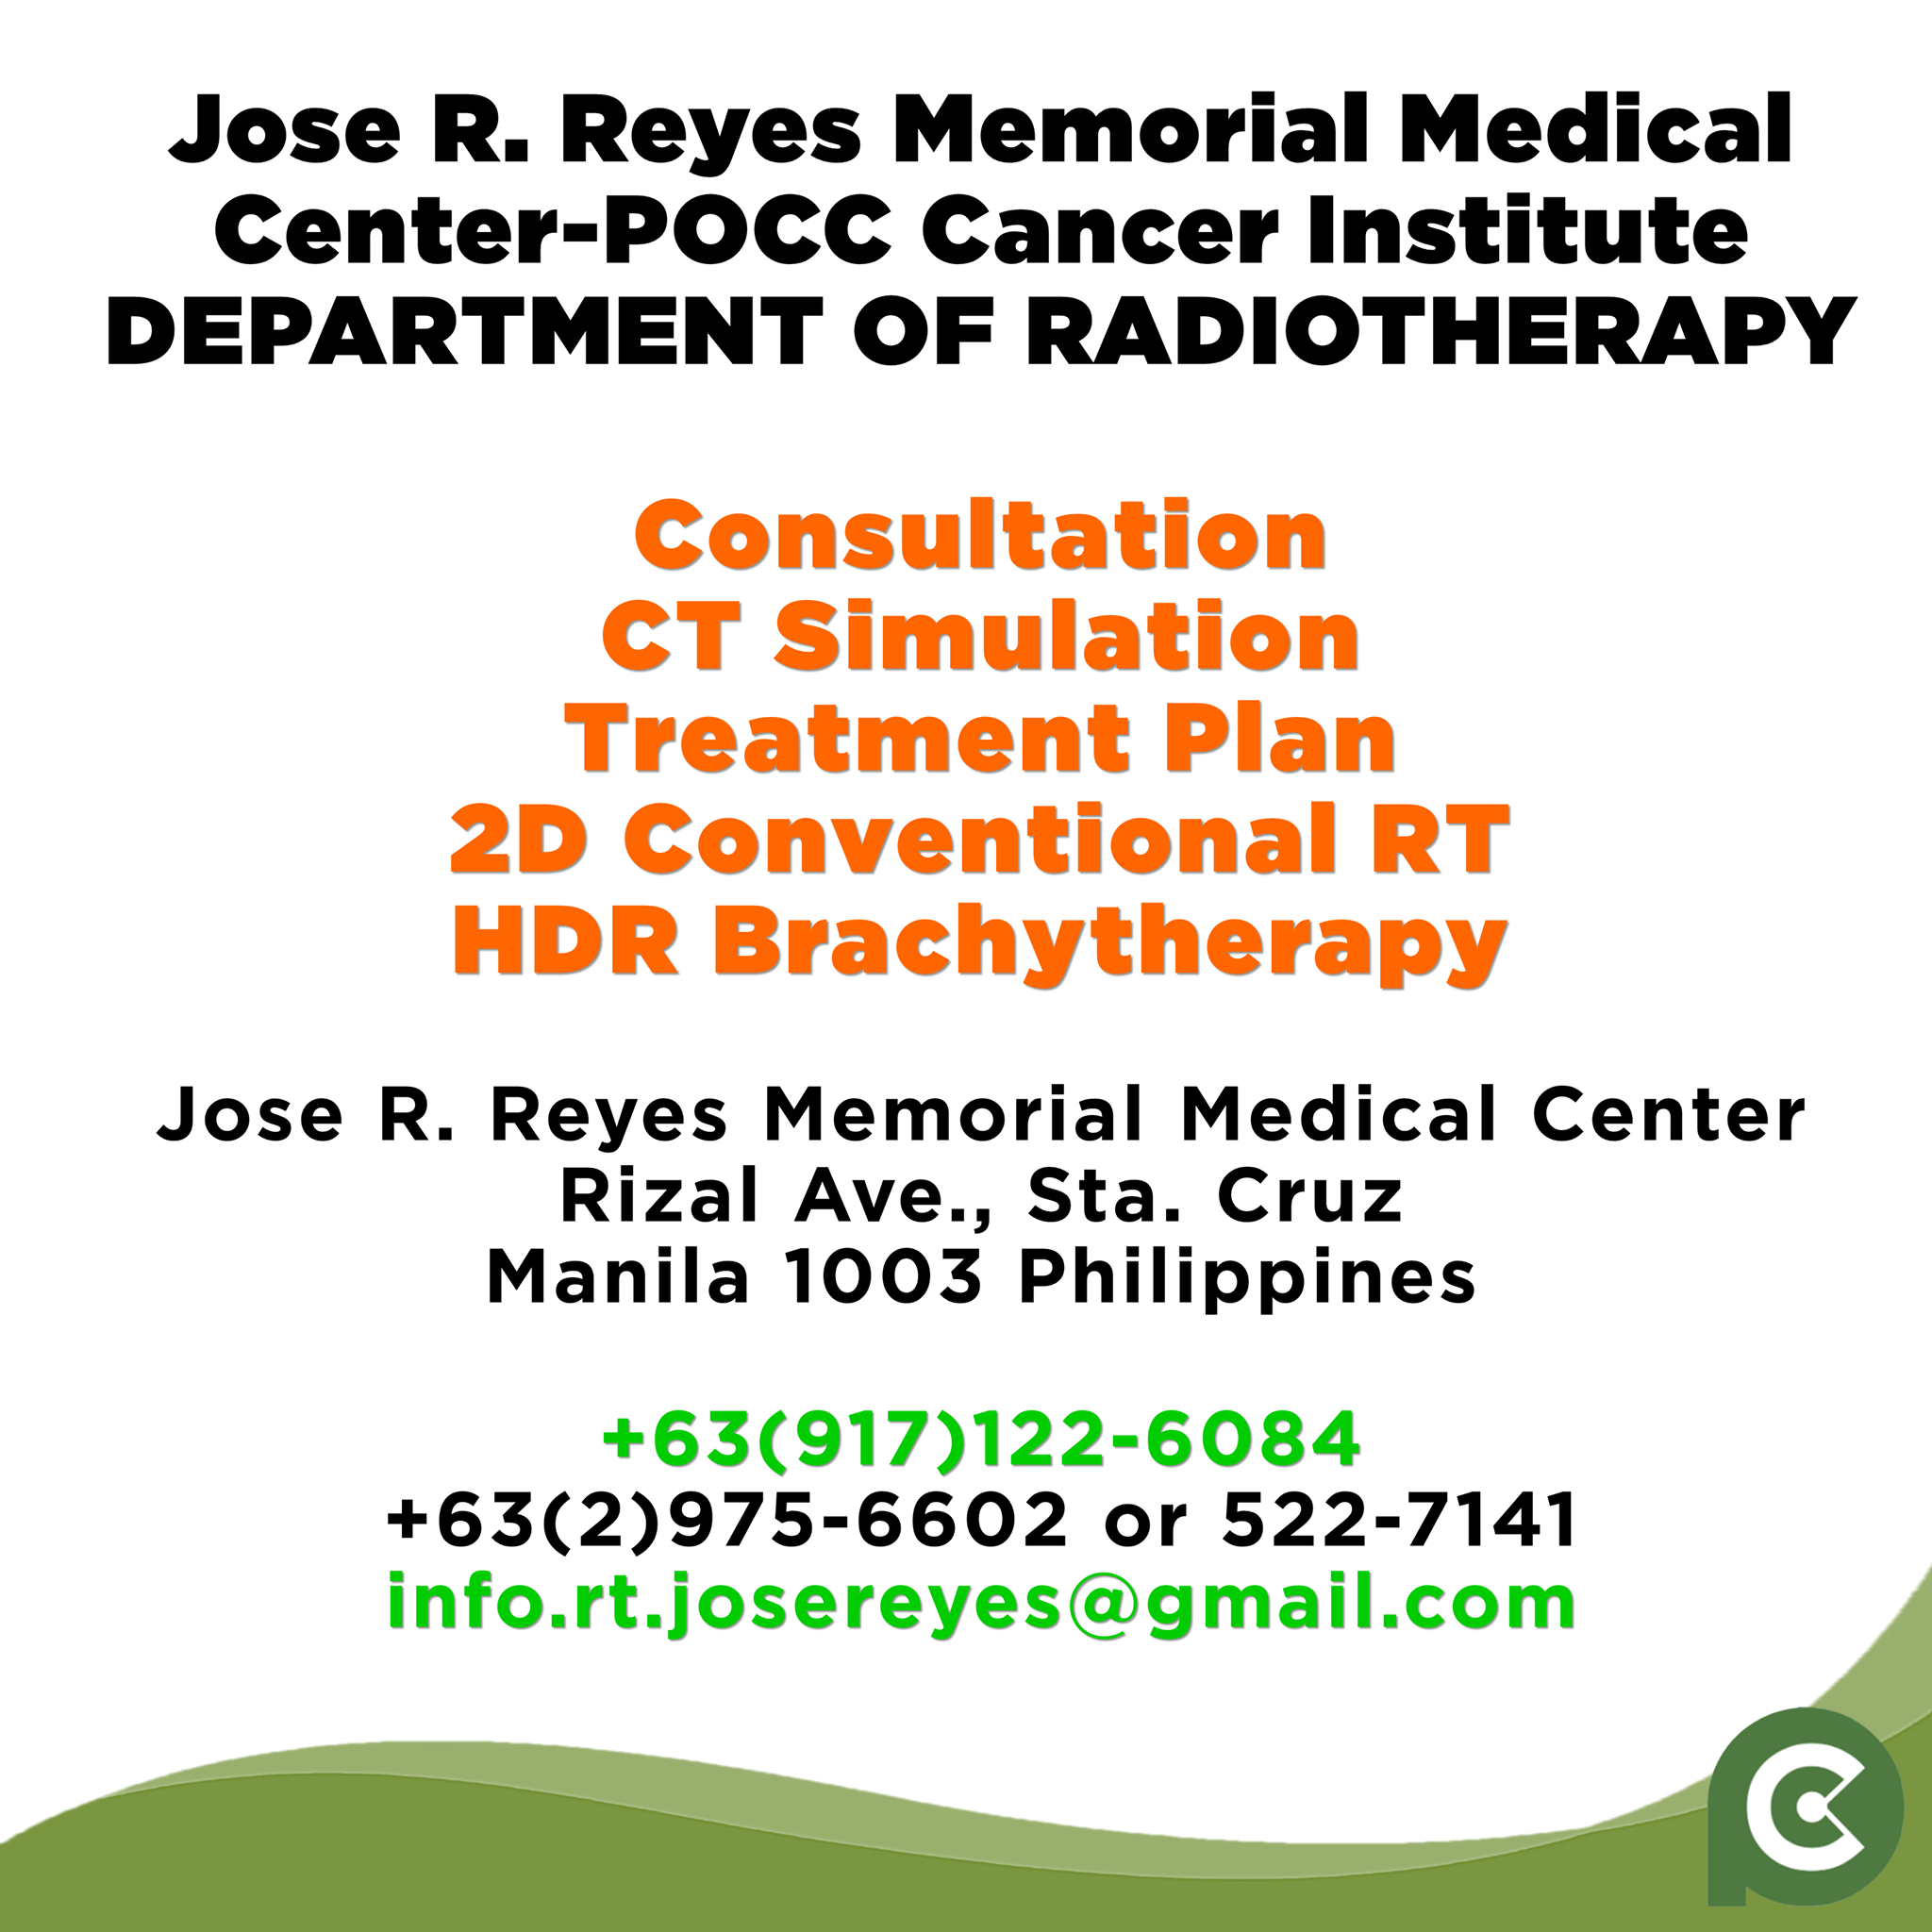 JRRMMC Services